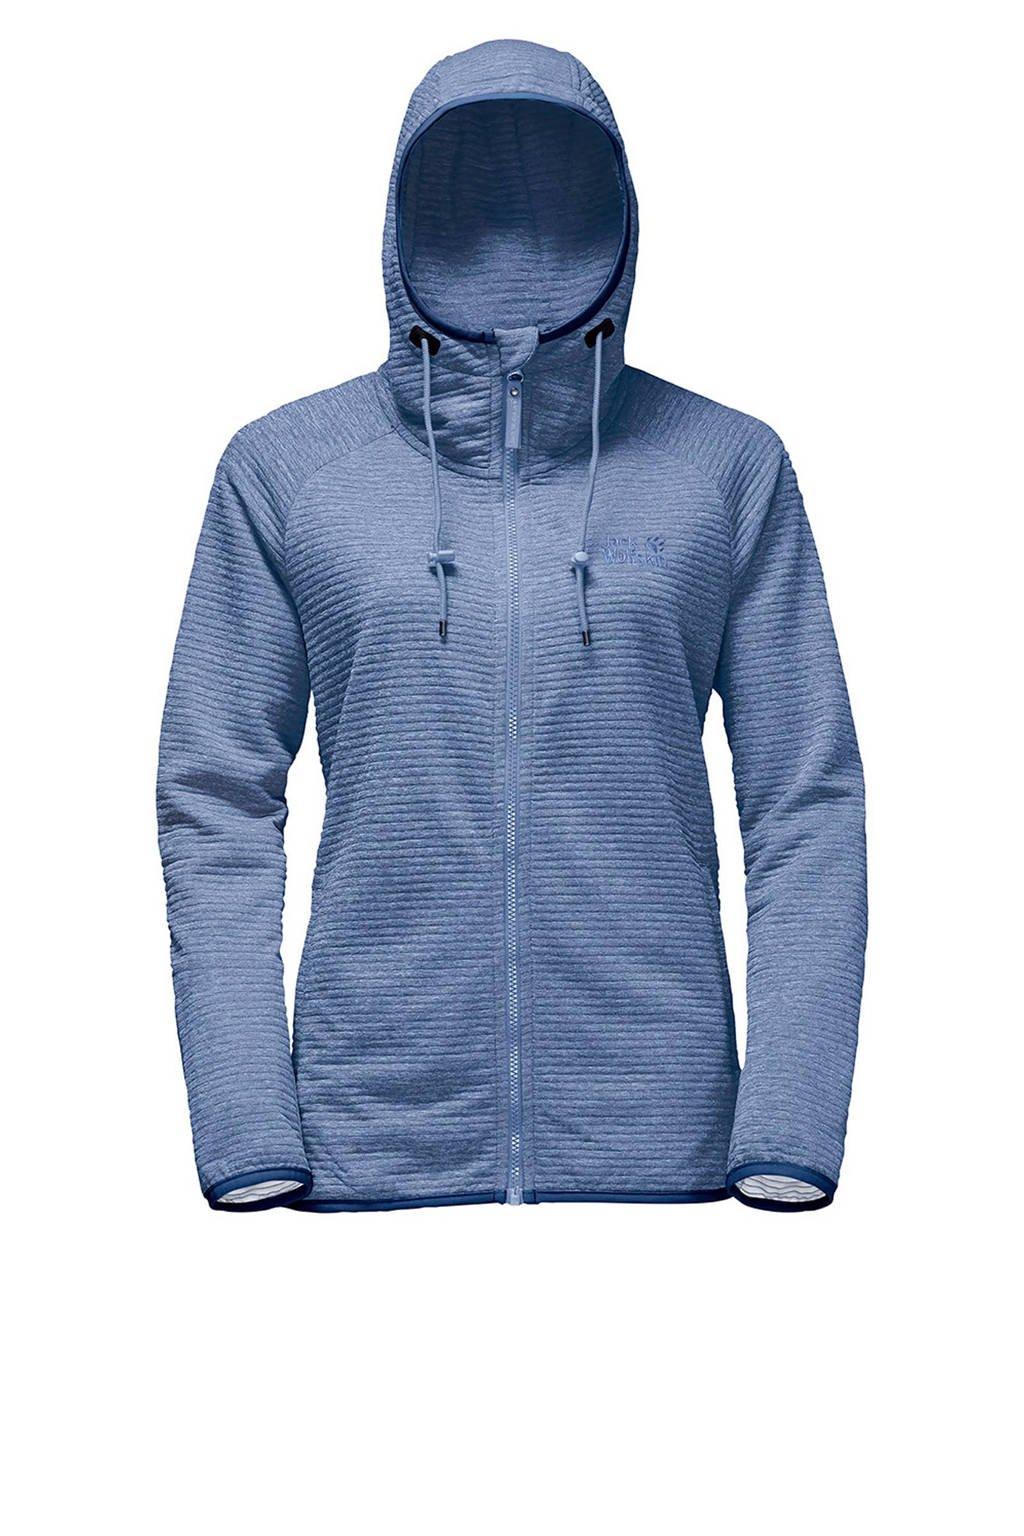 Jack Wolfskin Tongari Hooded fleece vest, Blauw